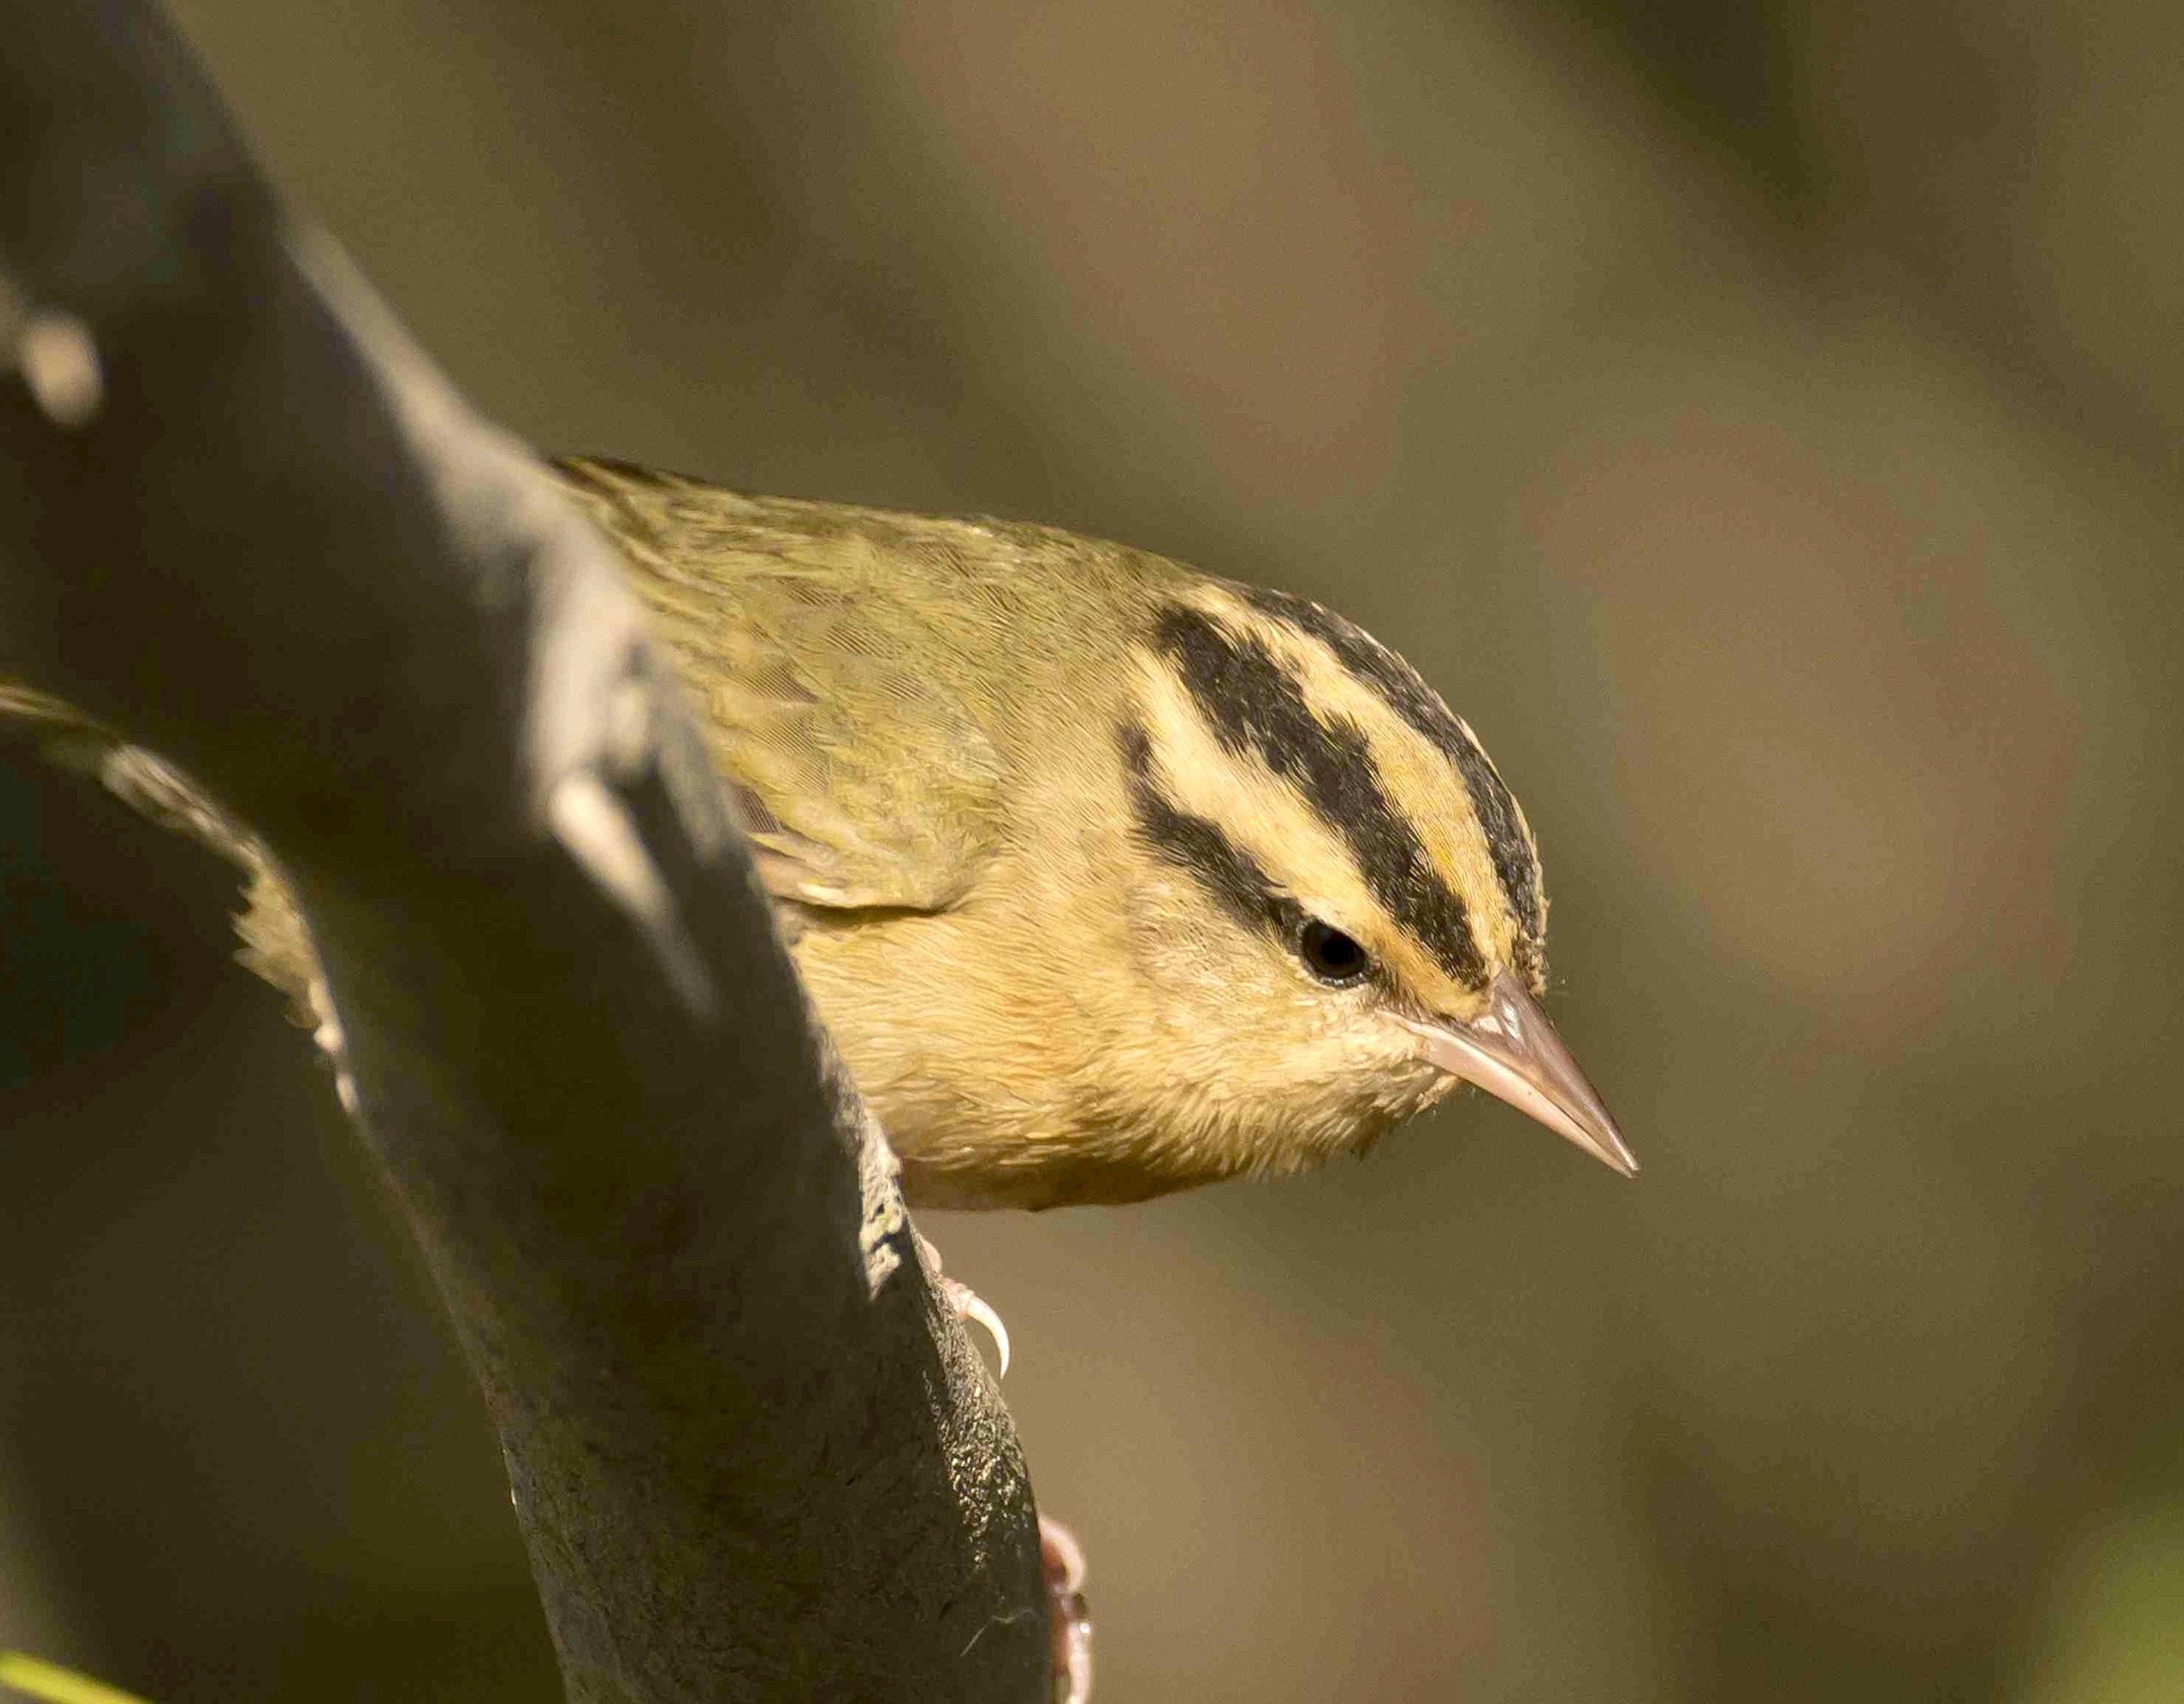 worm-eating-warbler-bahama-palm-shores-abaco-bahamas-3-12-tom-sheley-small-copy